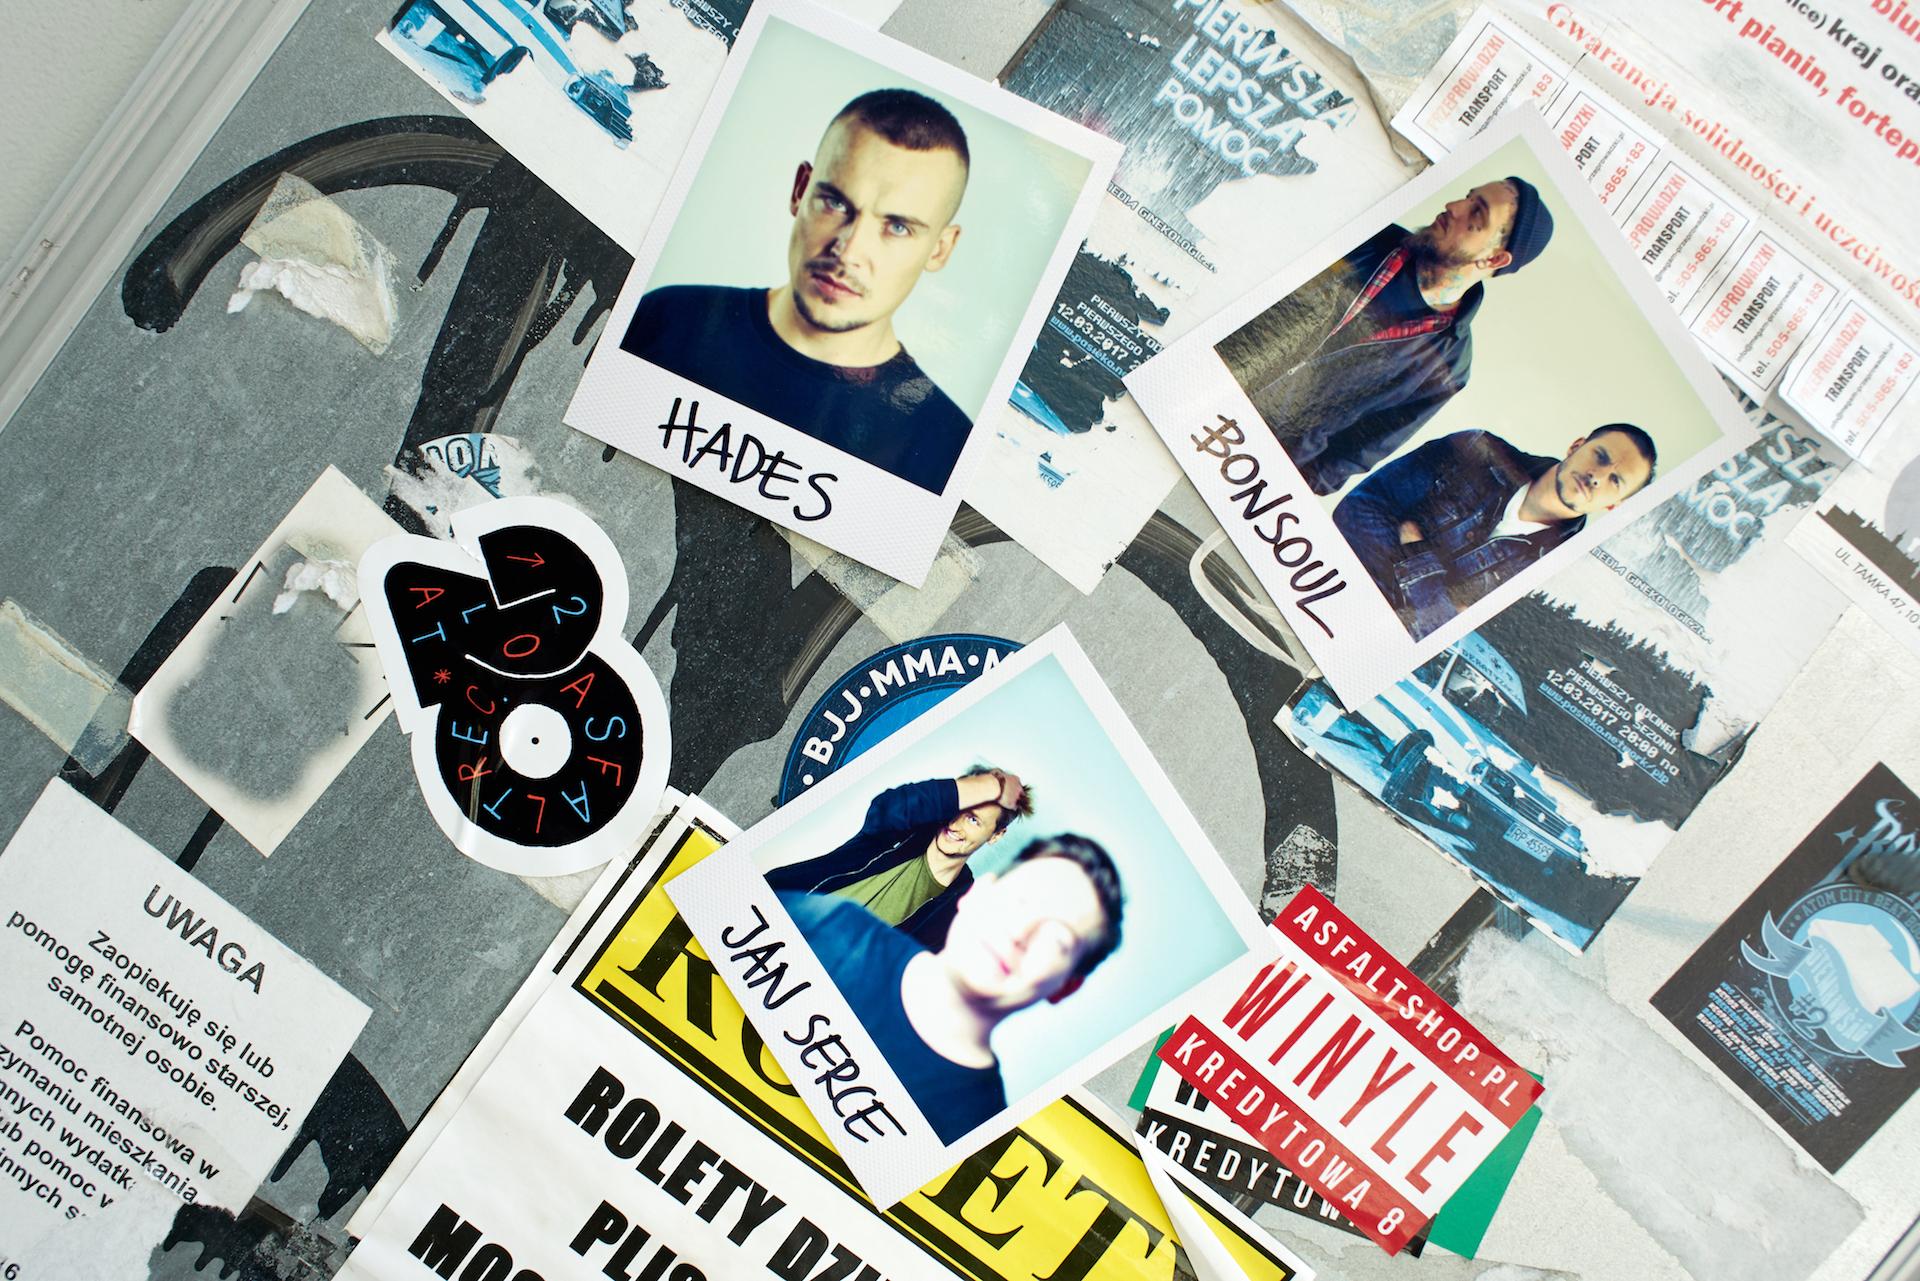 Nowi zawodnicy w Asfalt Records: Hades, BonSoul, Jan Serce